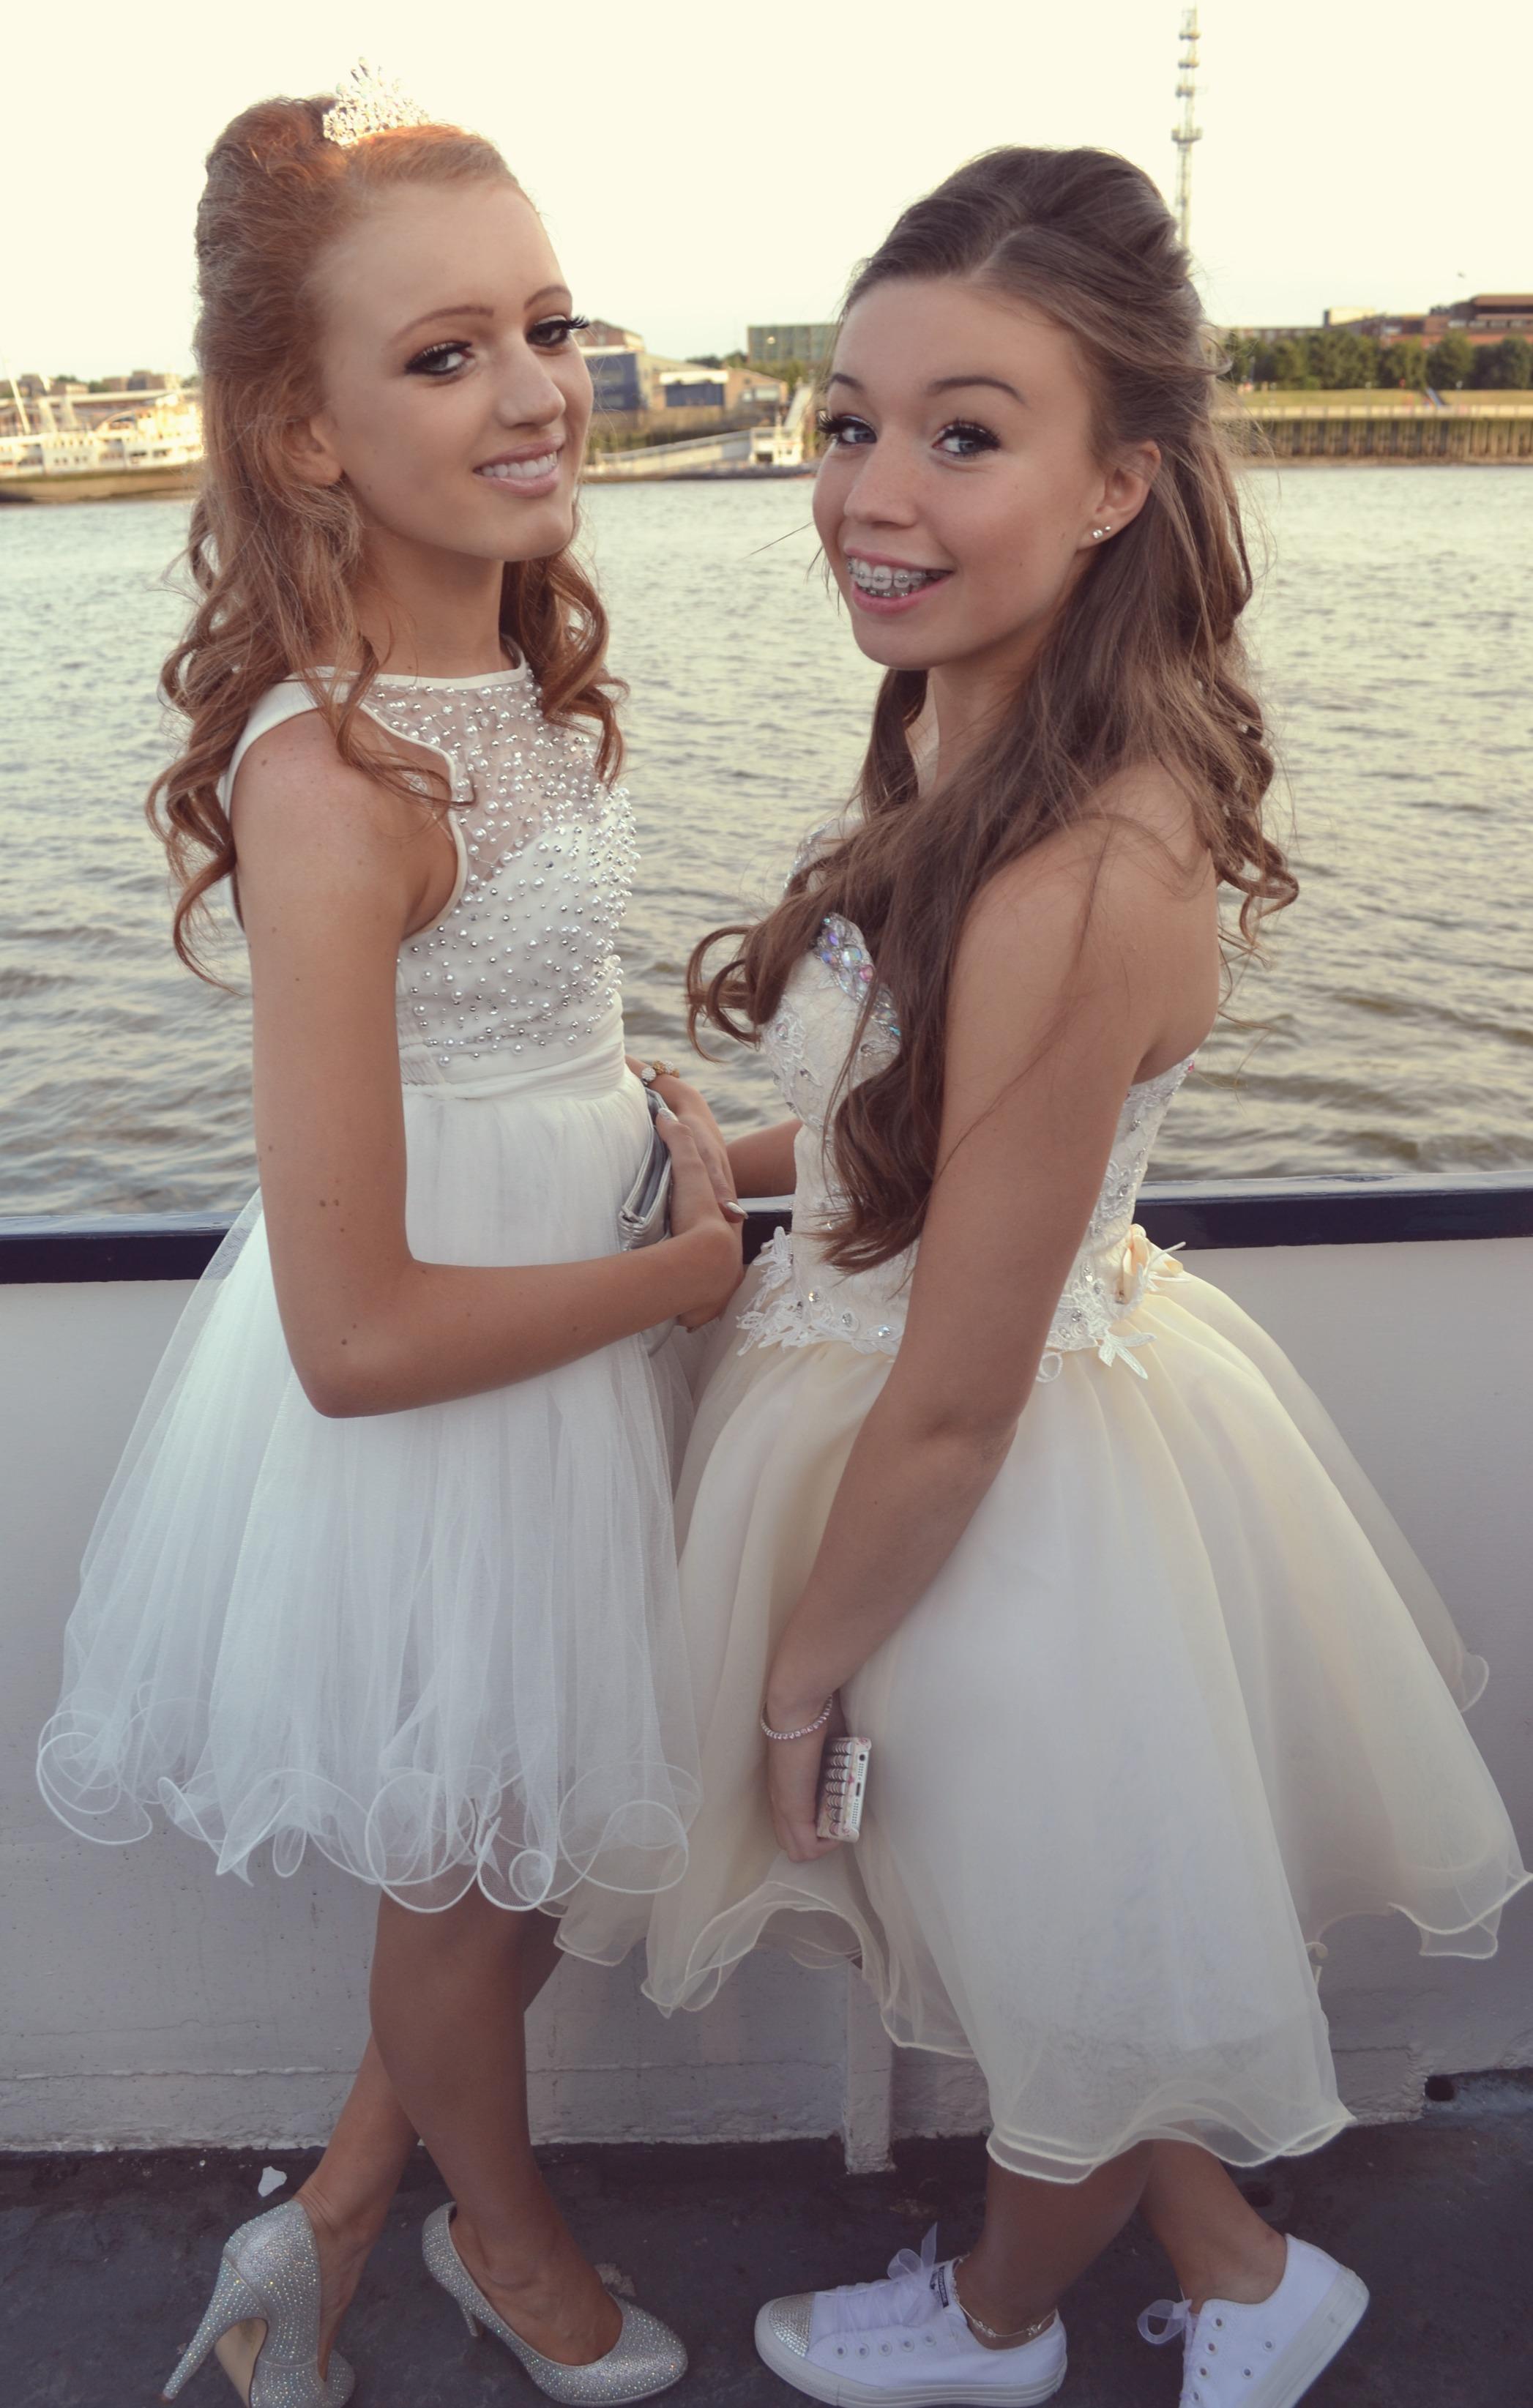 Jade and Charlotte